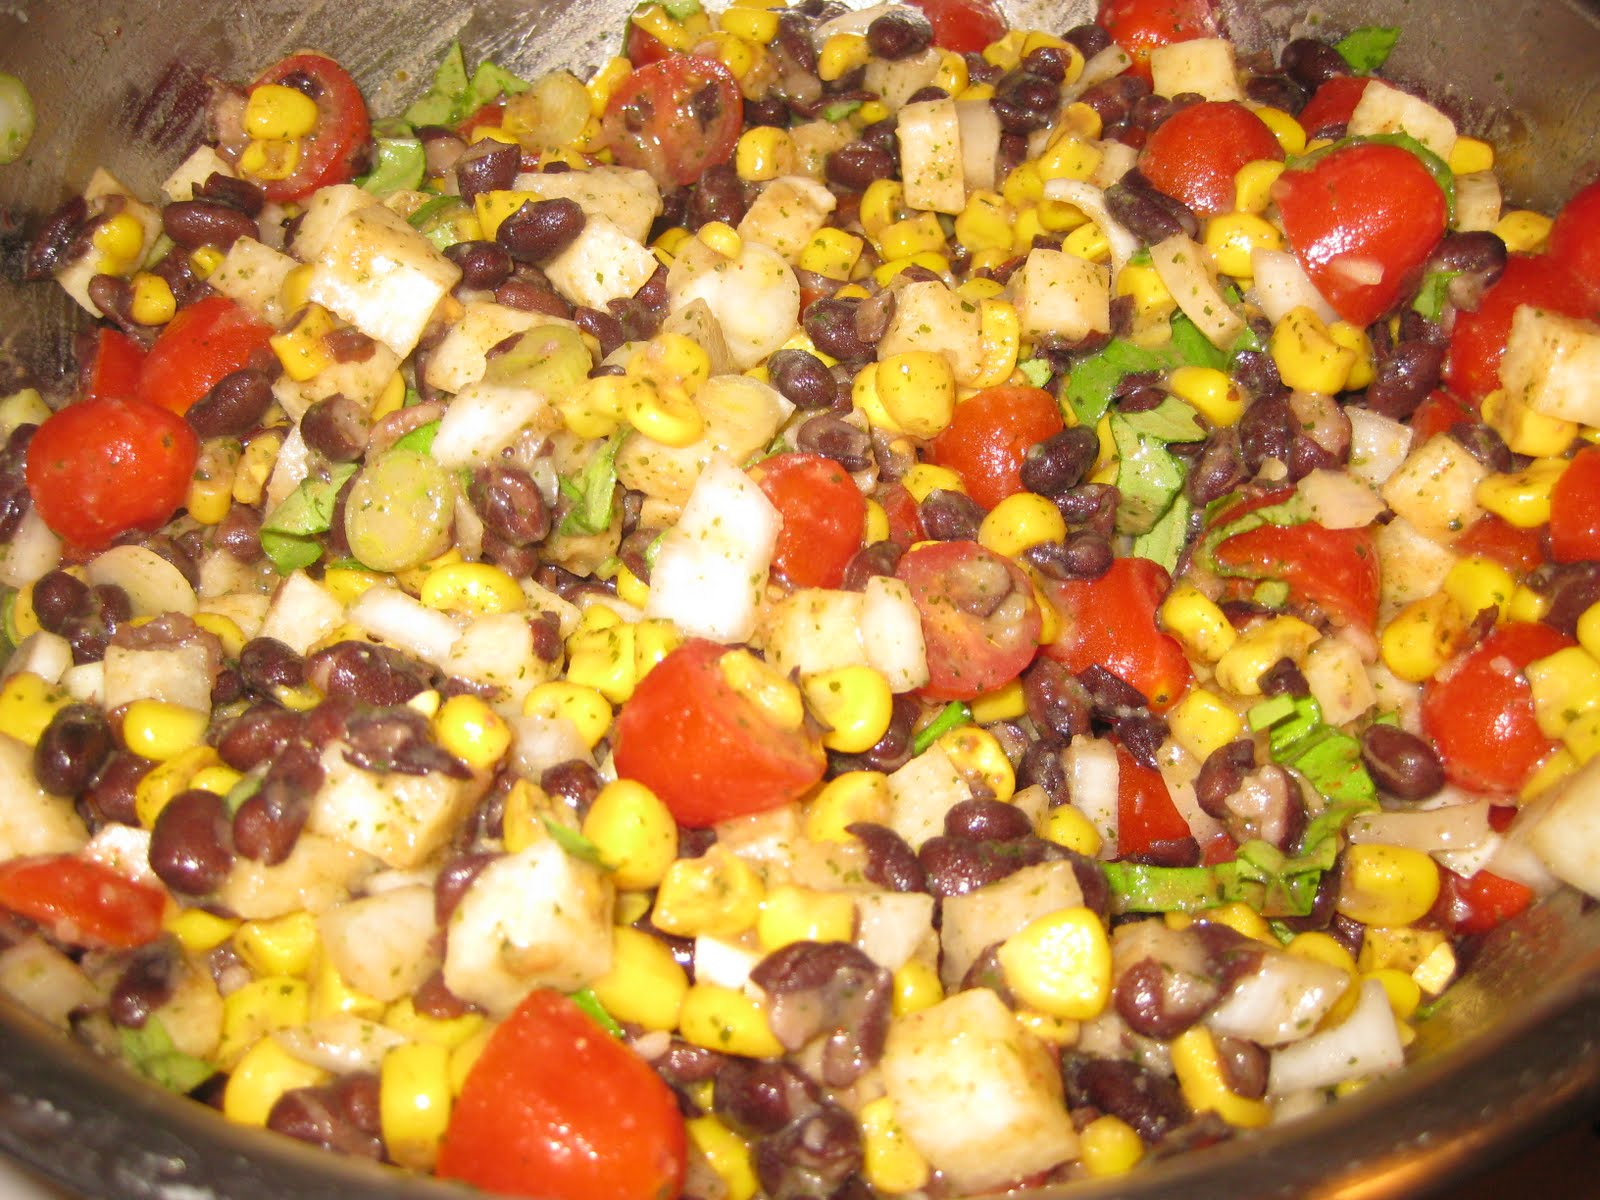 The Full Plate Blog: Black Bean, Corn & Jicama Salad